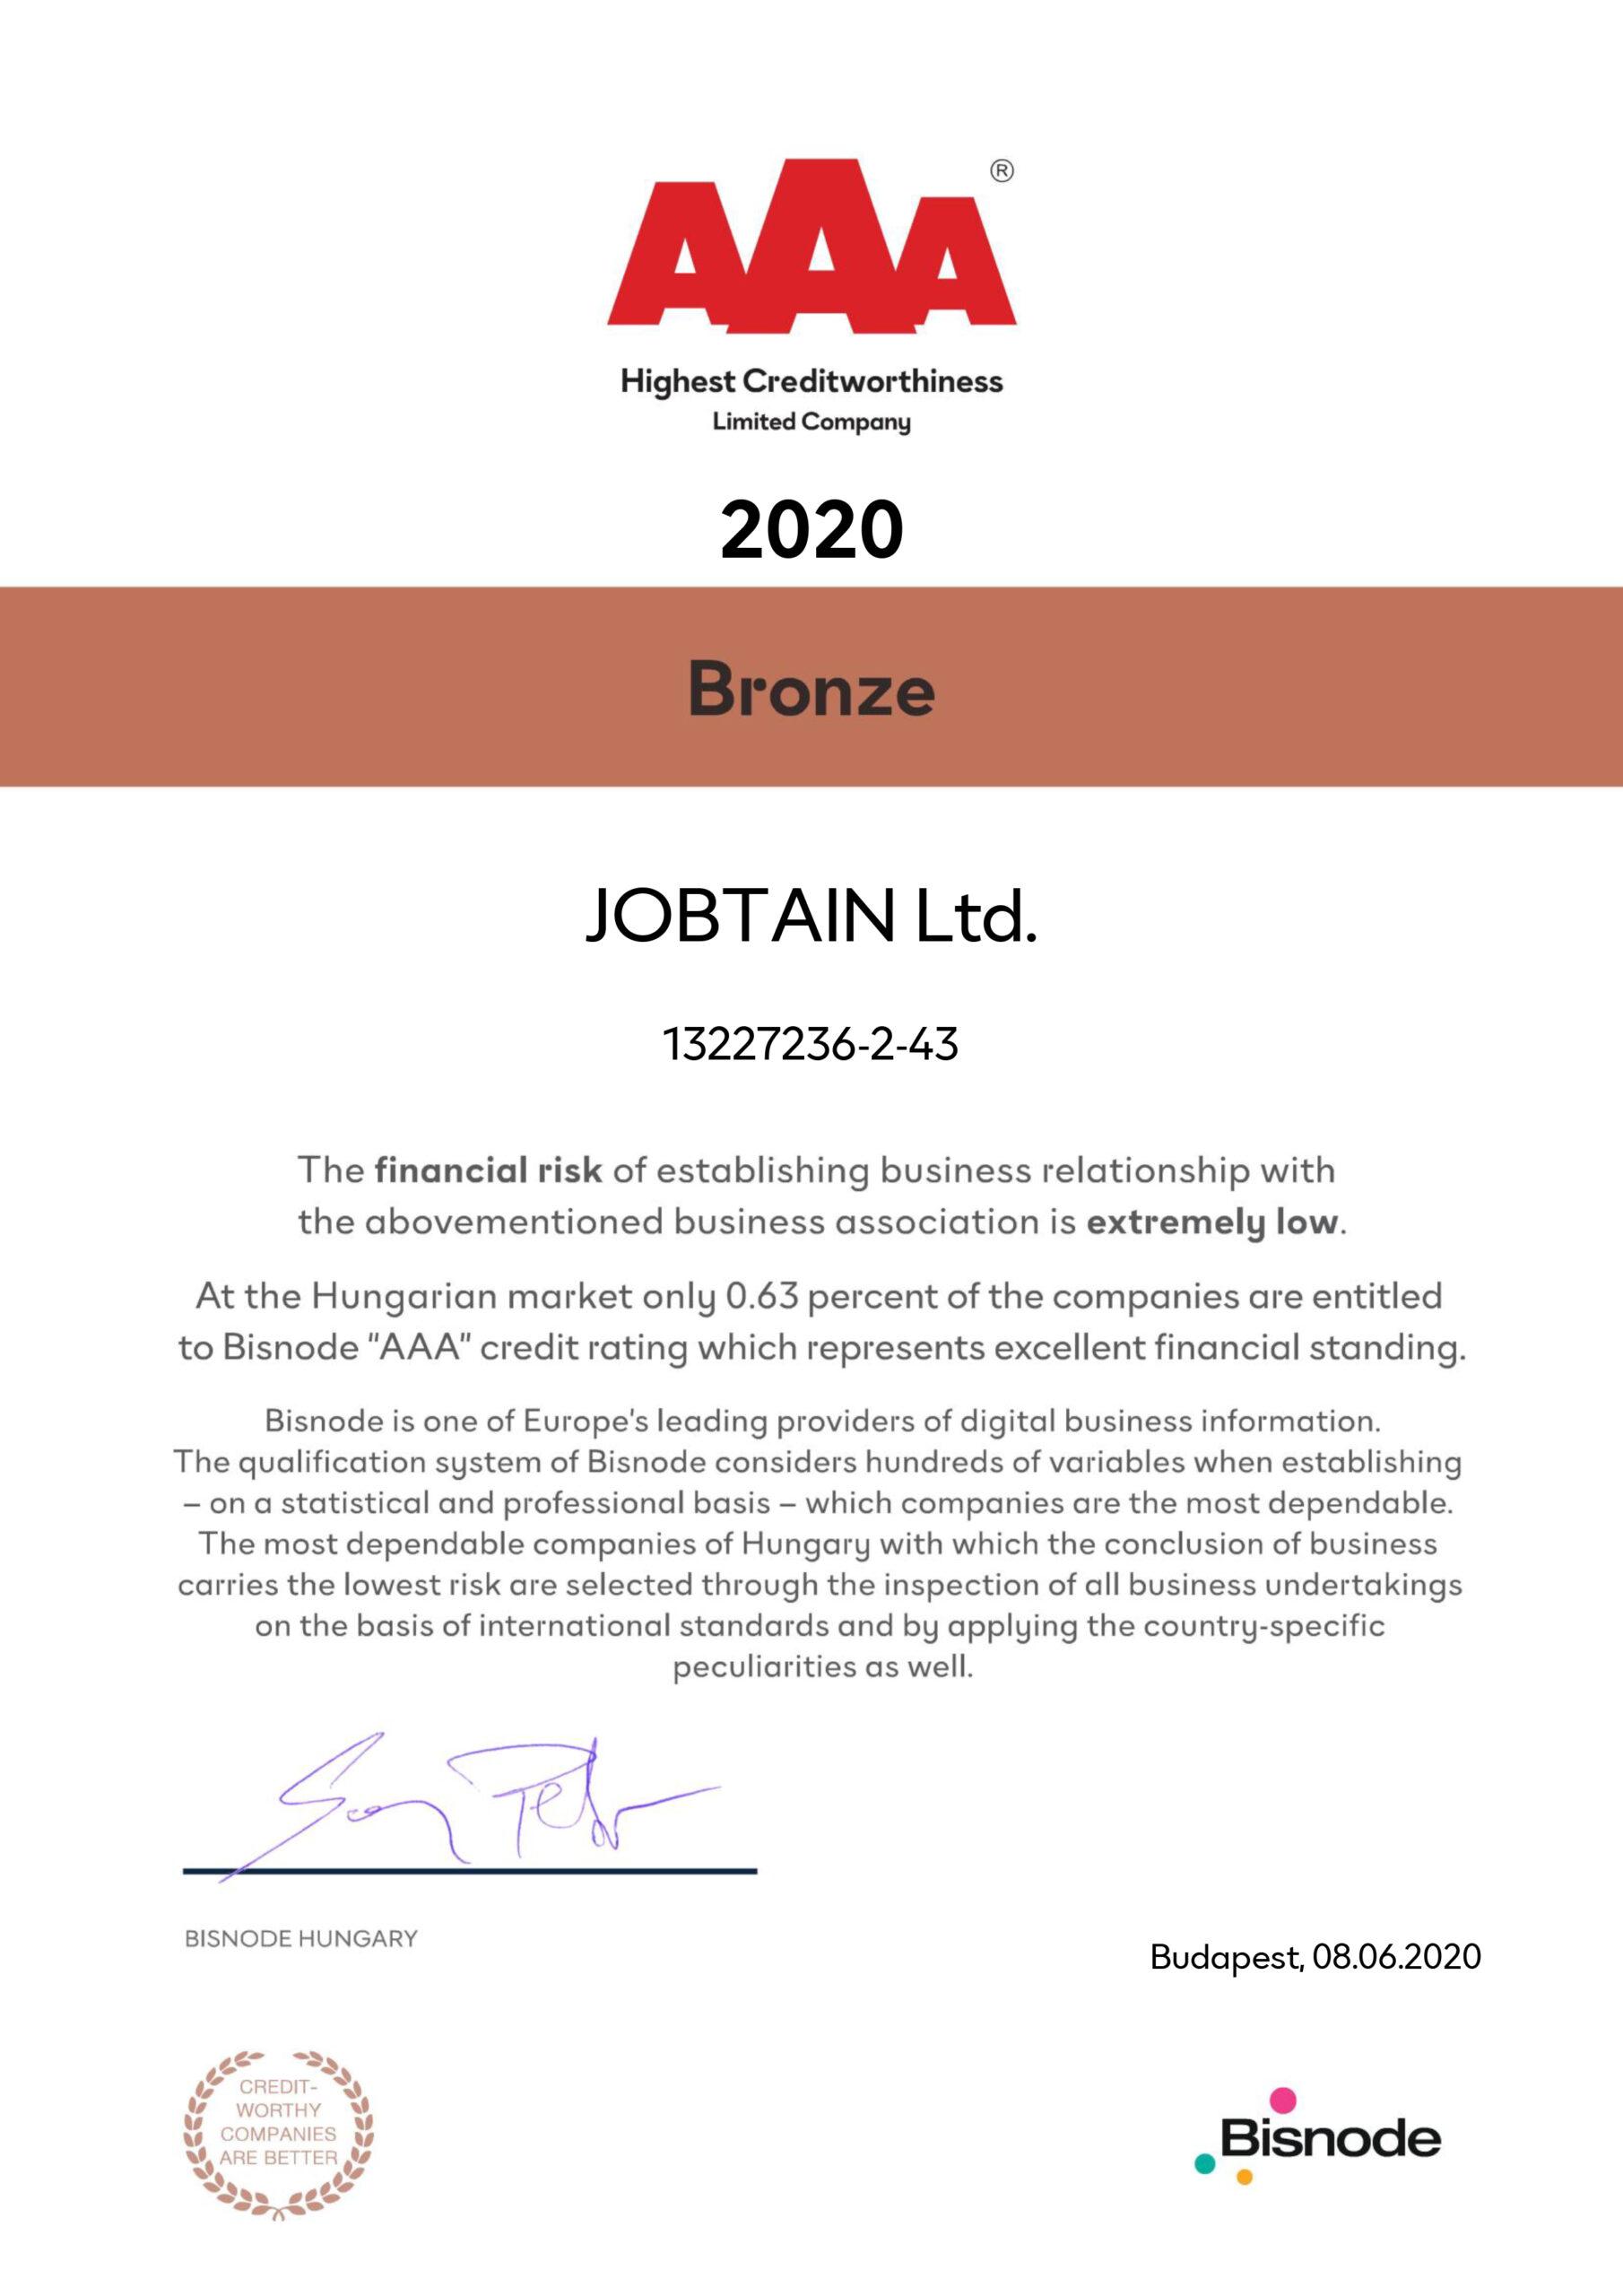 Jobtain Bisdone Certificate